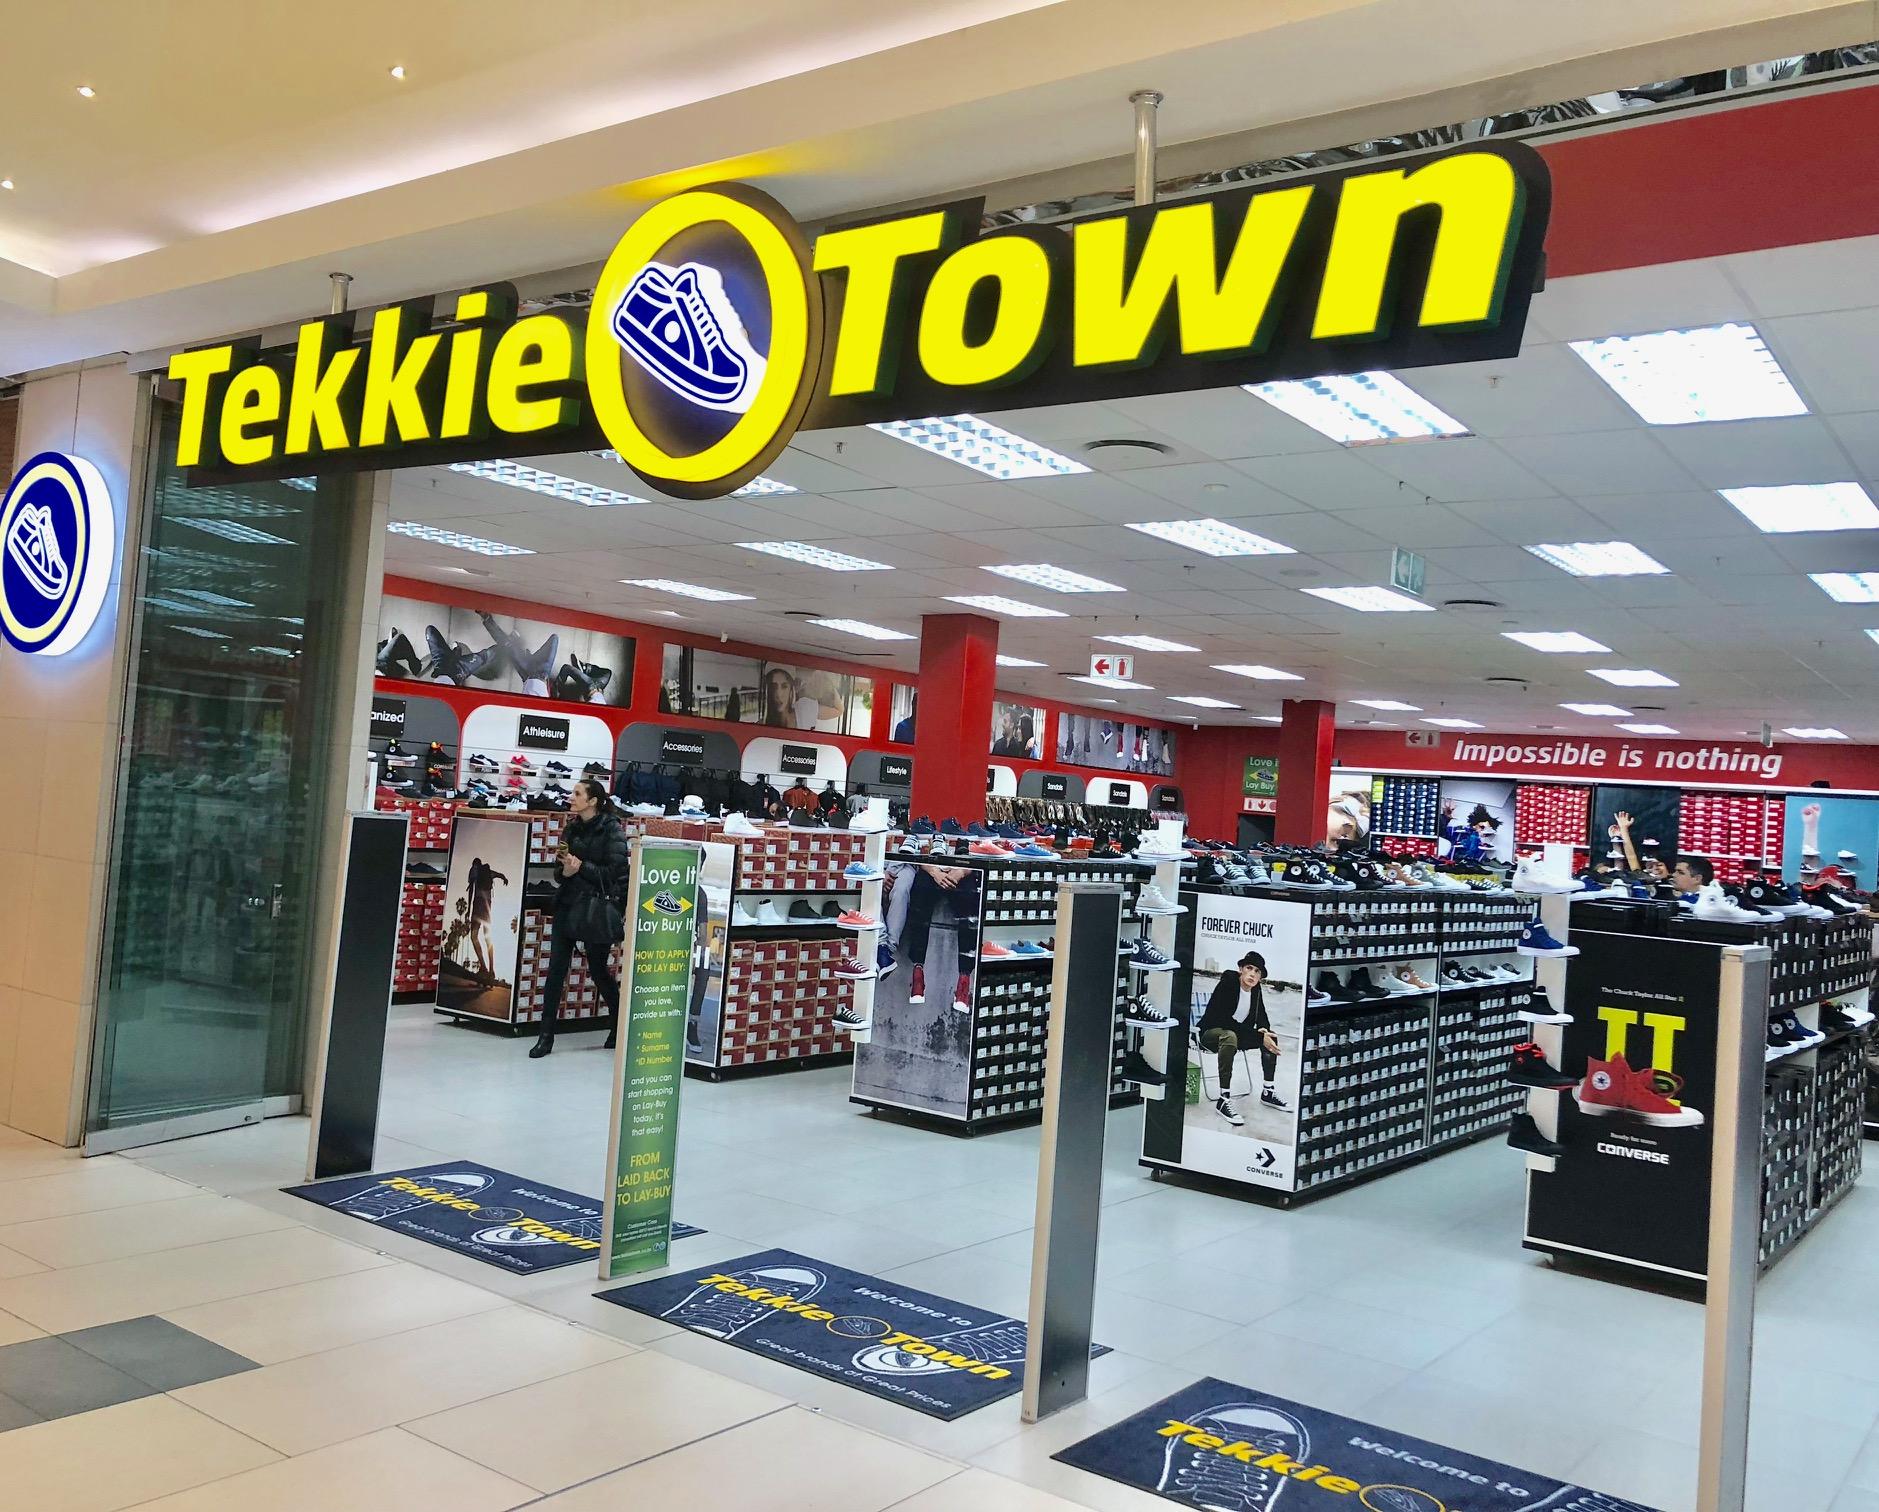 TEKKIE TOWN SALES 21